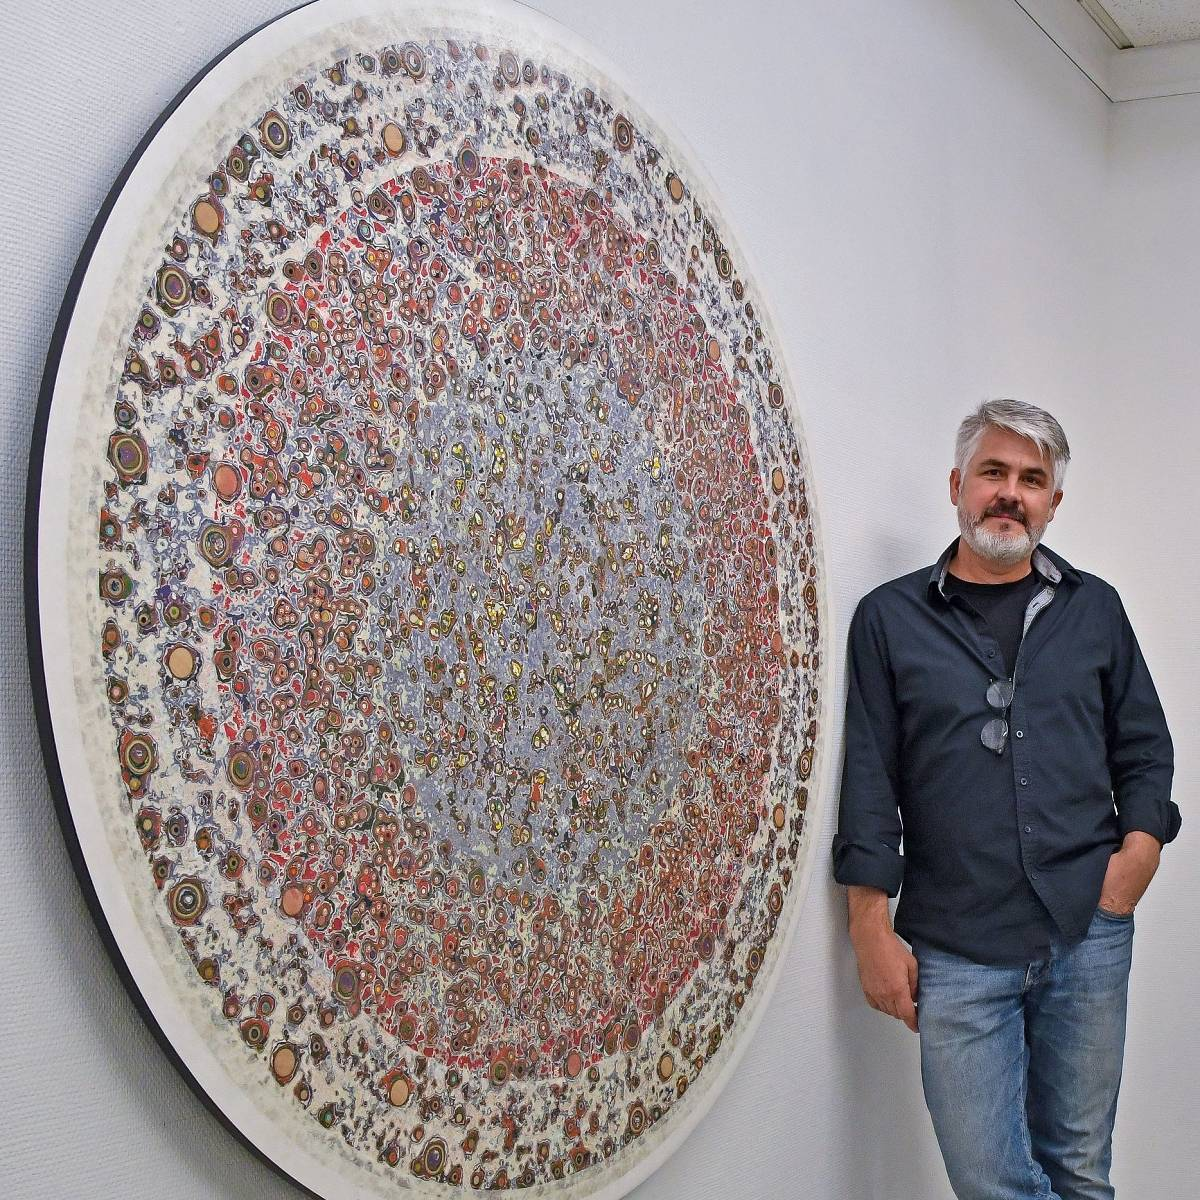 Kamp Lintfort Ivica Matijevic Stellt In Der Galerie Schurmann Aus